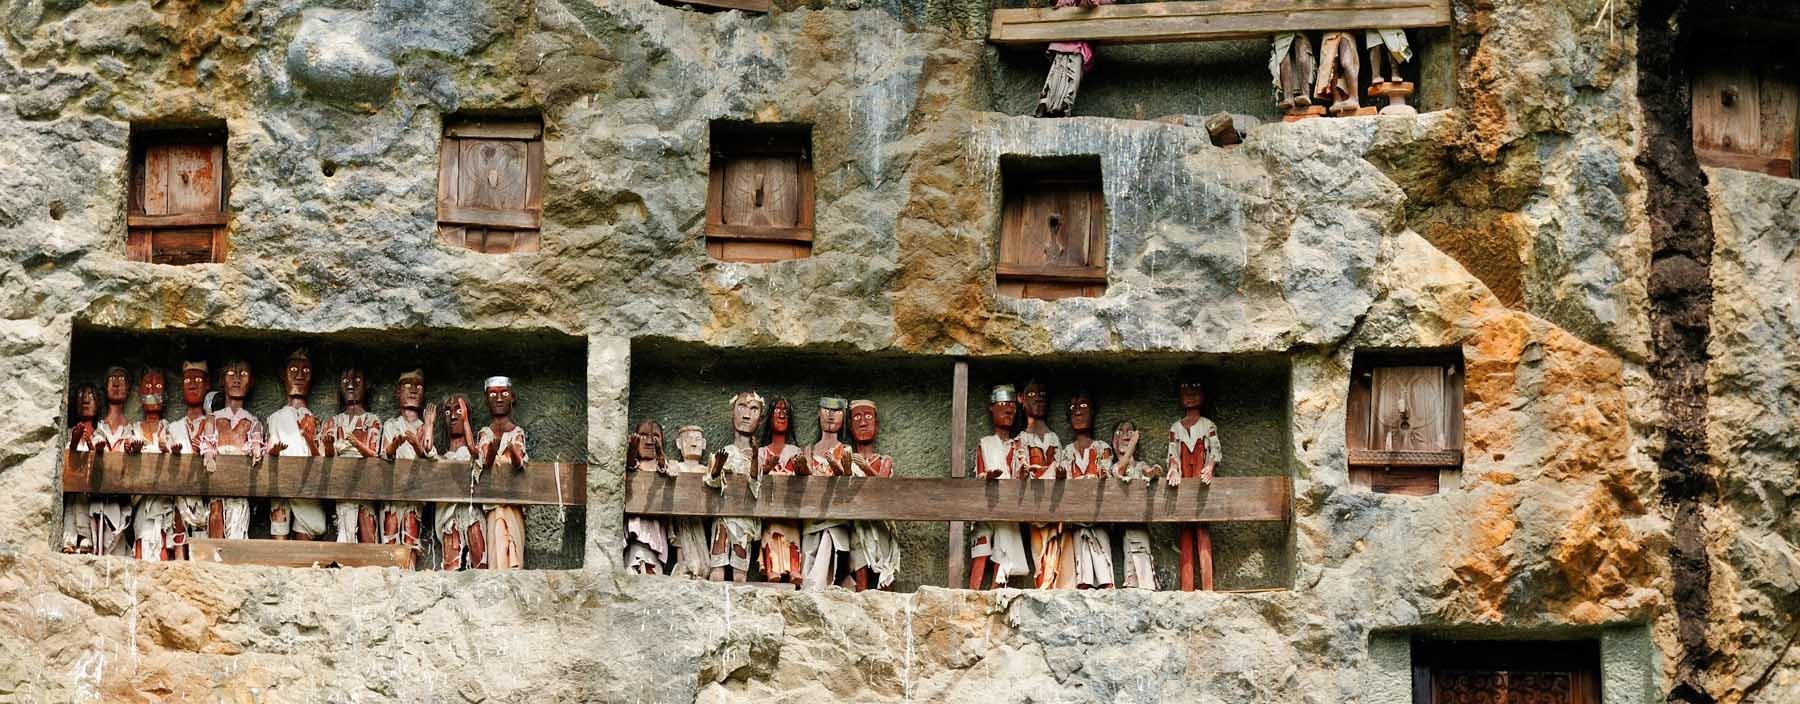 id, sulawesi, tana toraja - londa, burial cave.jpg